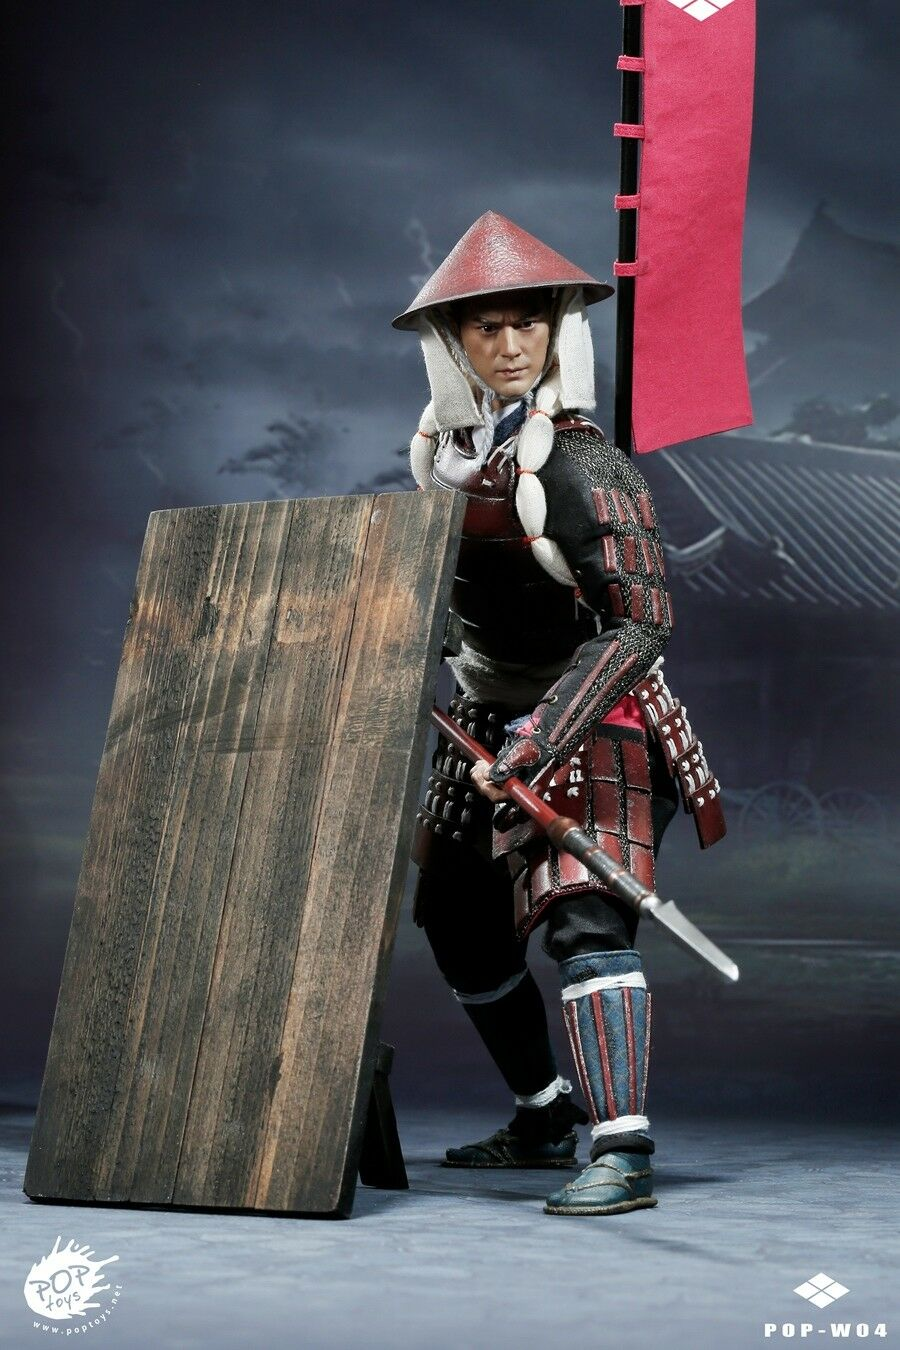 POPTOYS 1 6 Scale Armor Spearman Ashigaru-Spear Deluxe Ver POP-W04B